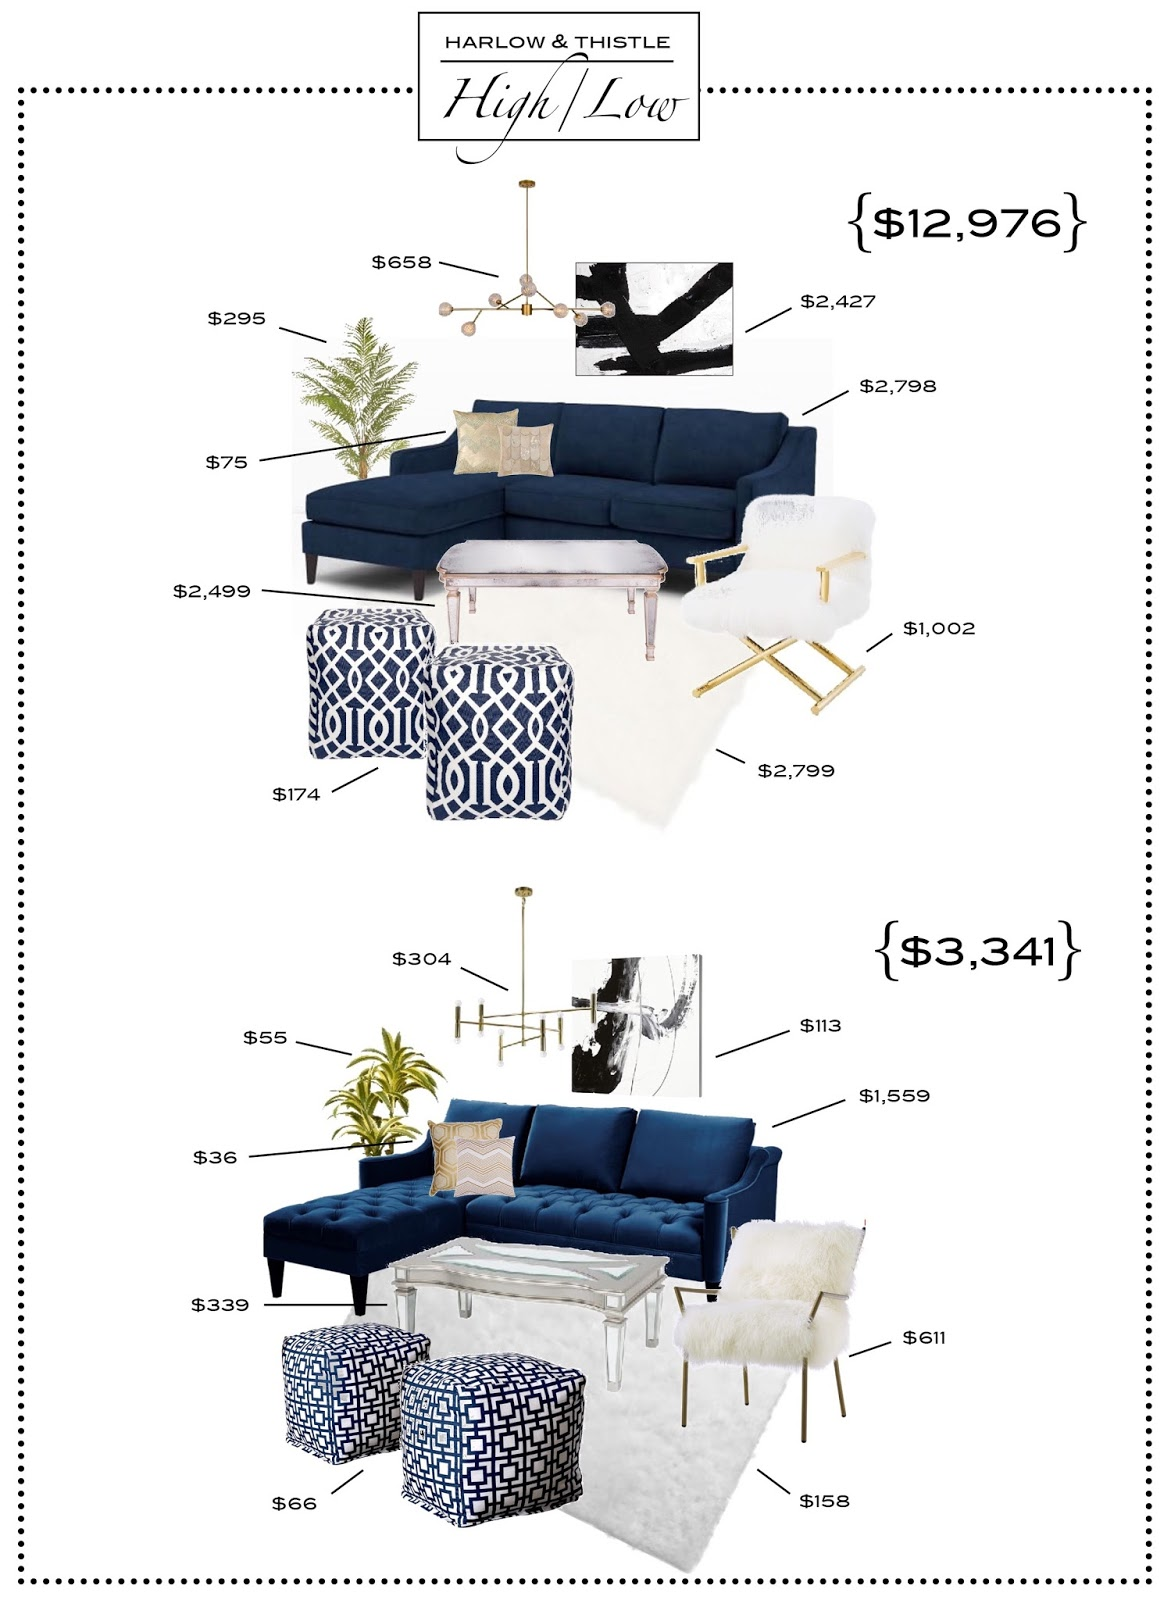 high-low living room design